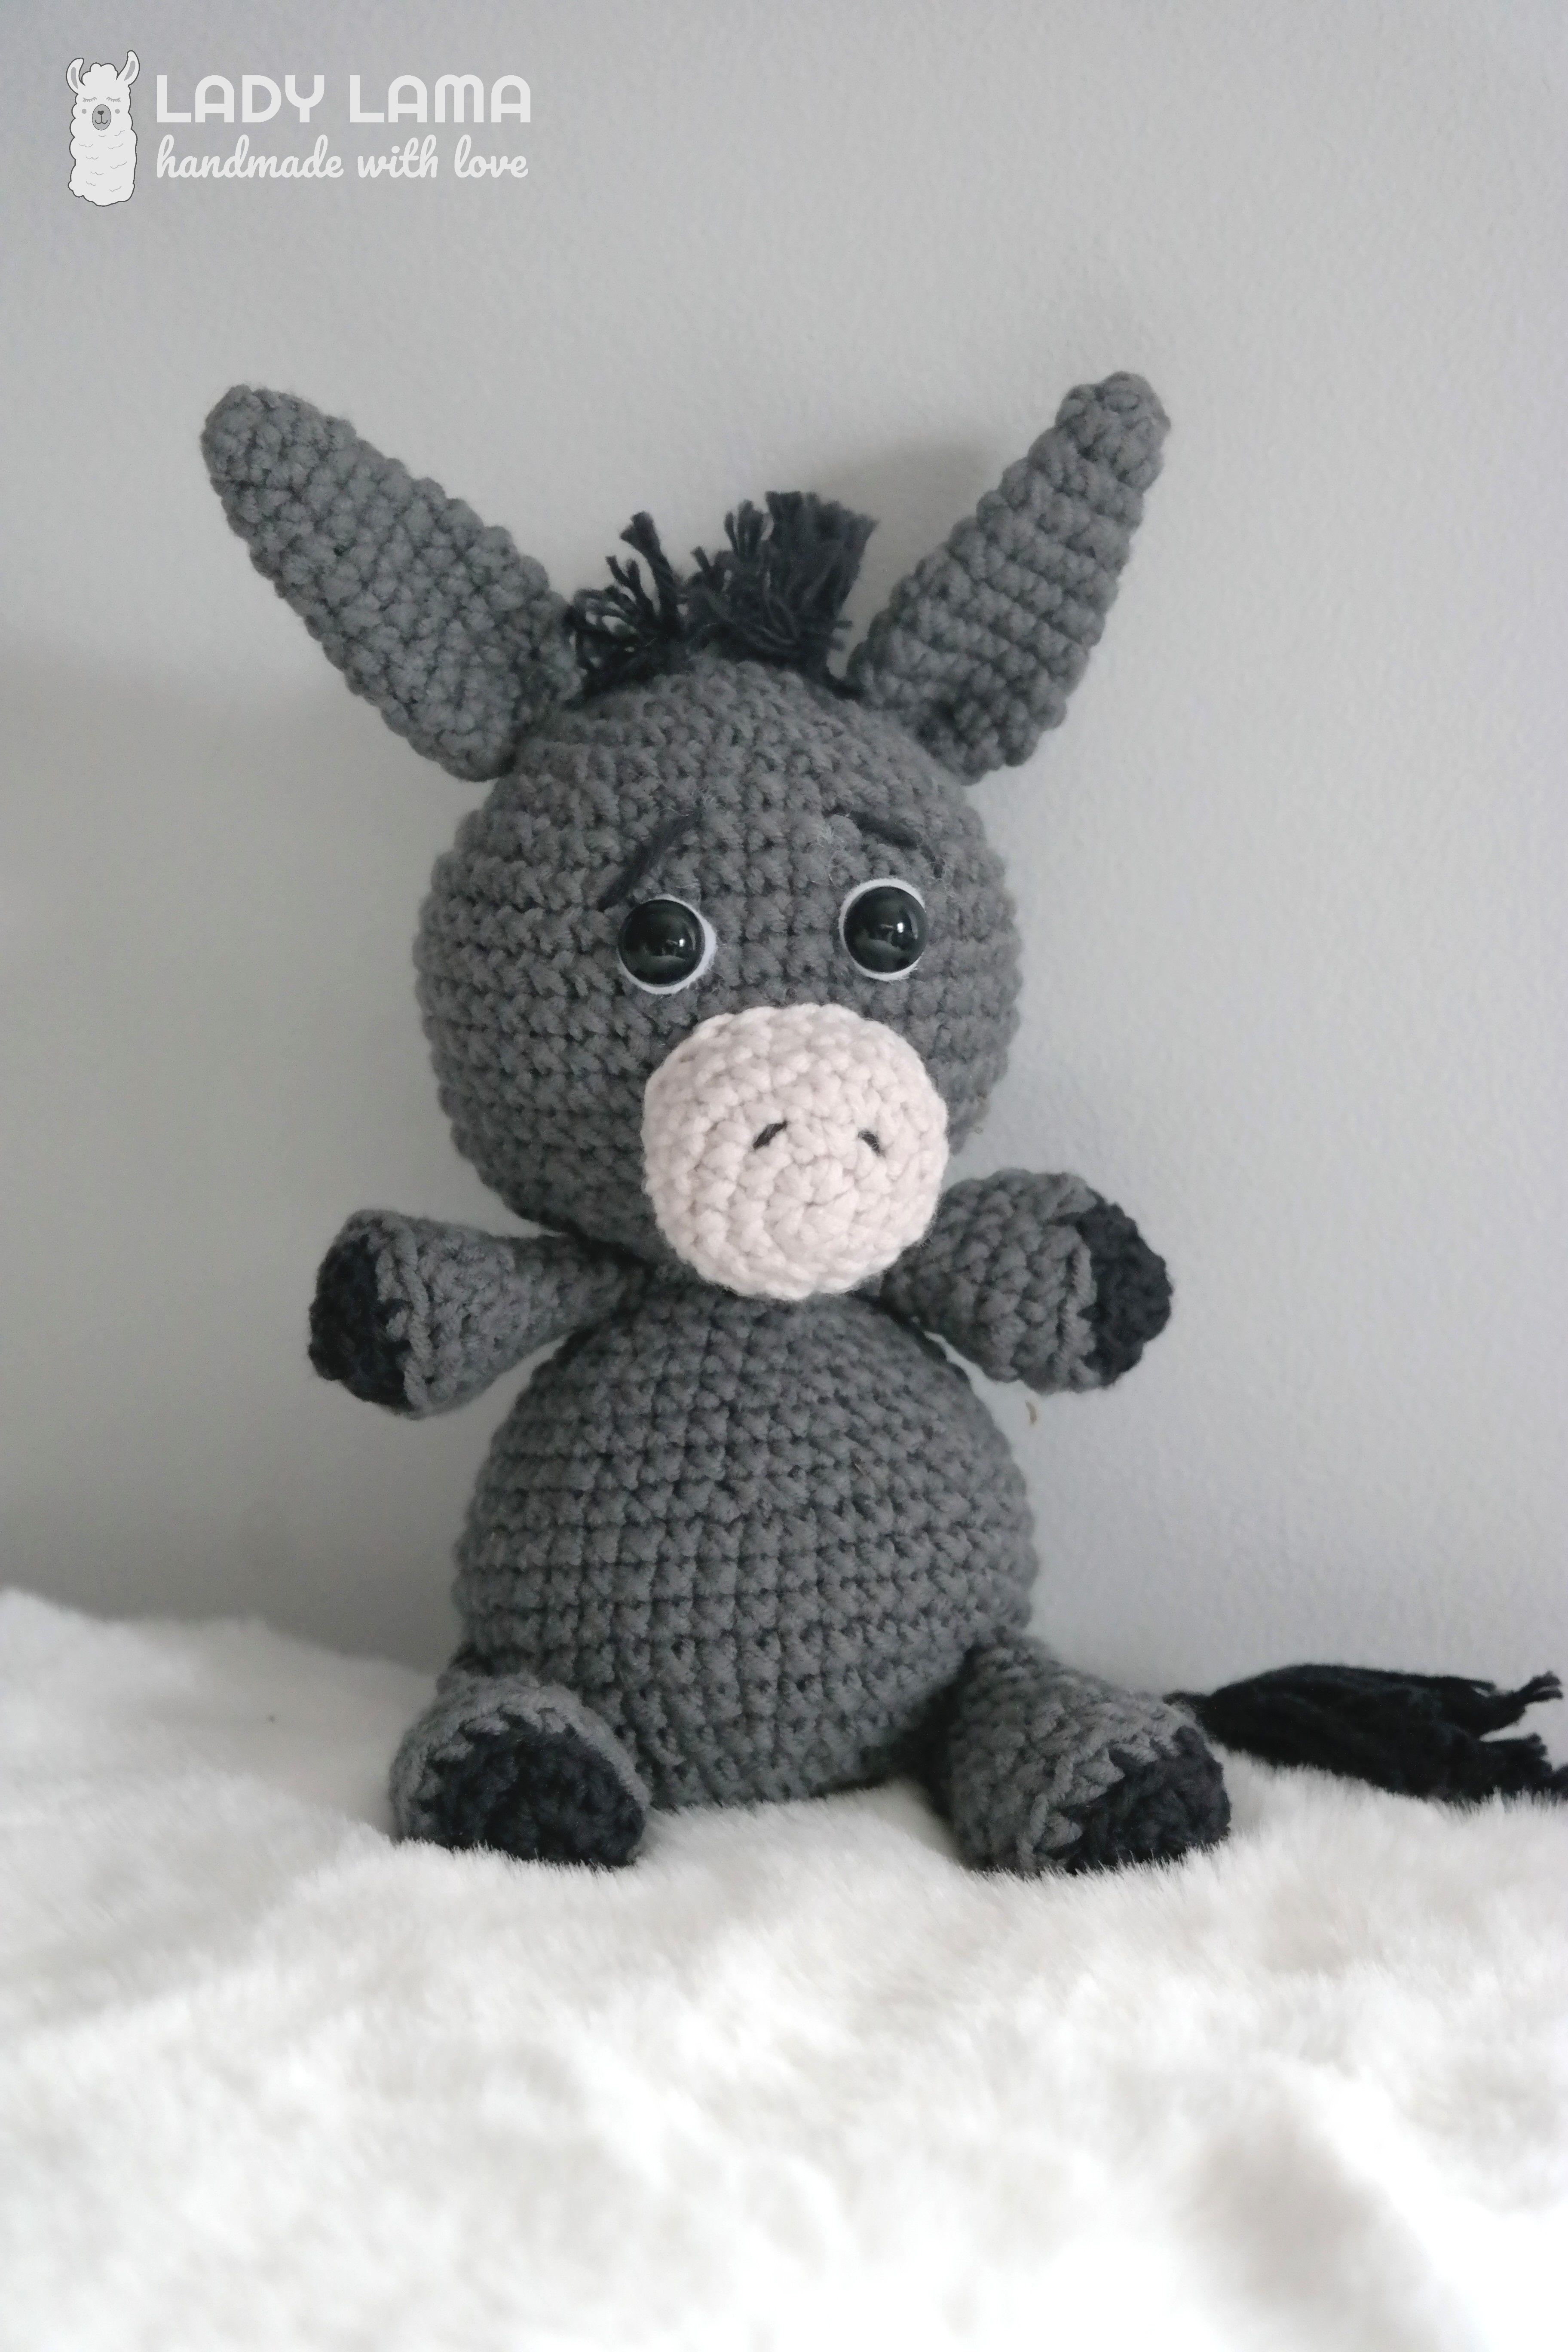 Amigurumi Crochet Pattern Donkey Amigurumi Pattern Animal | Etsy | 5472x3648